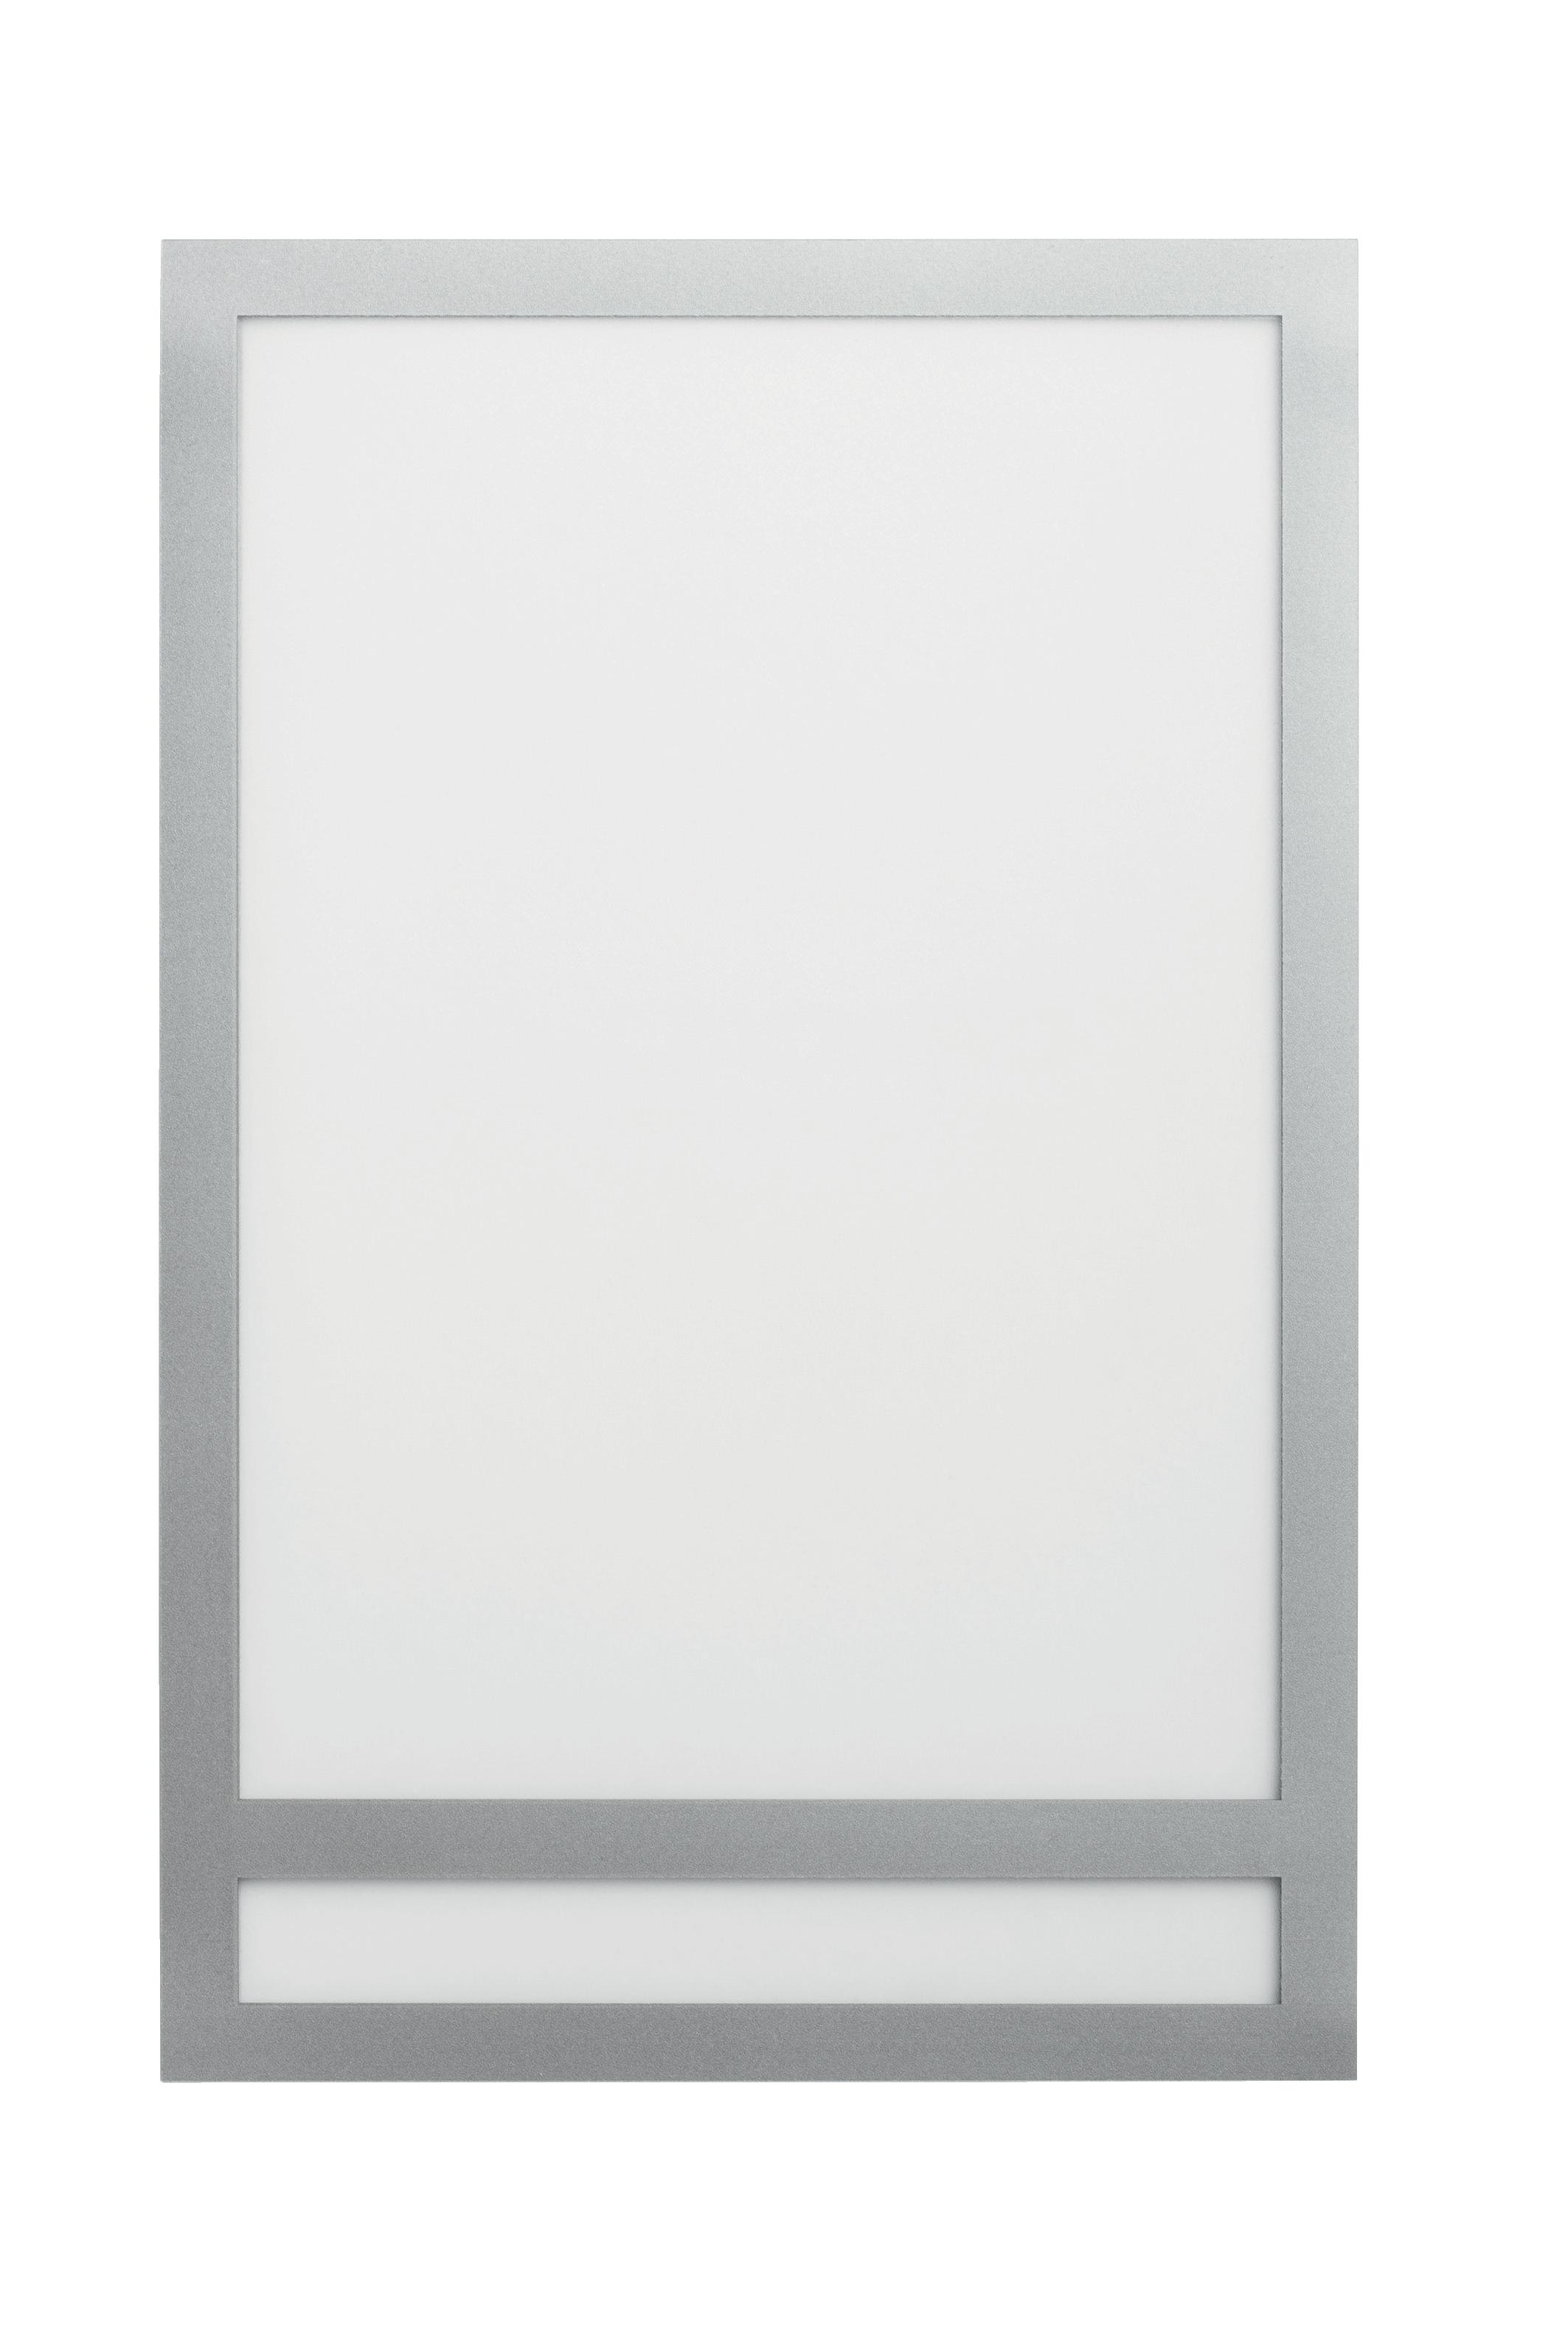 Durable Fotoframe Plus 18x13 cm - Silver